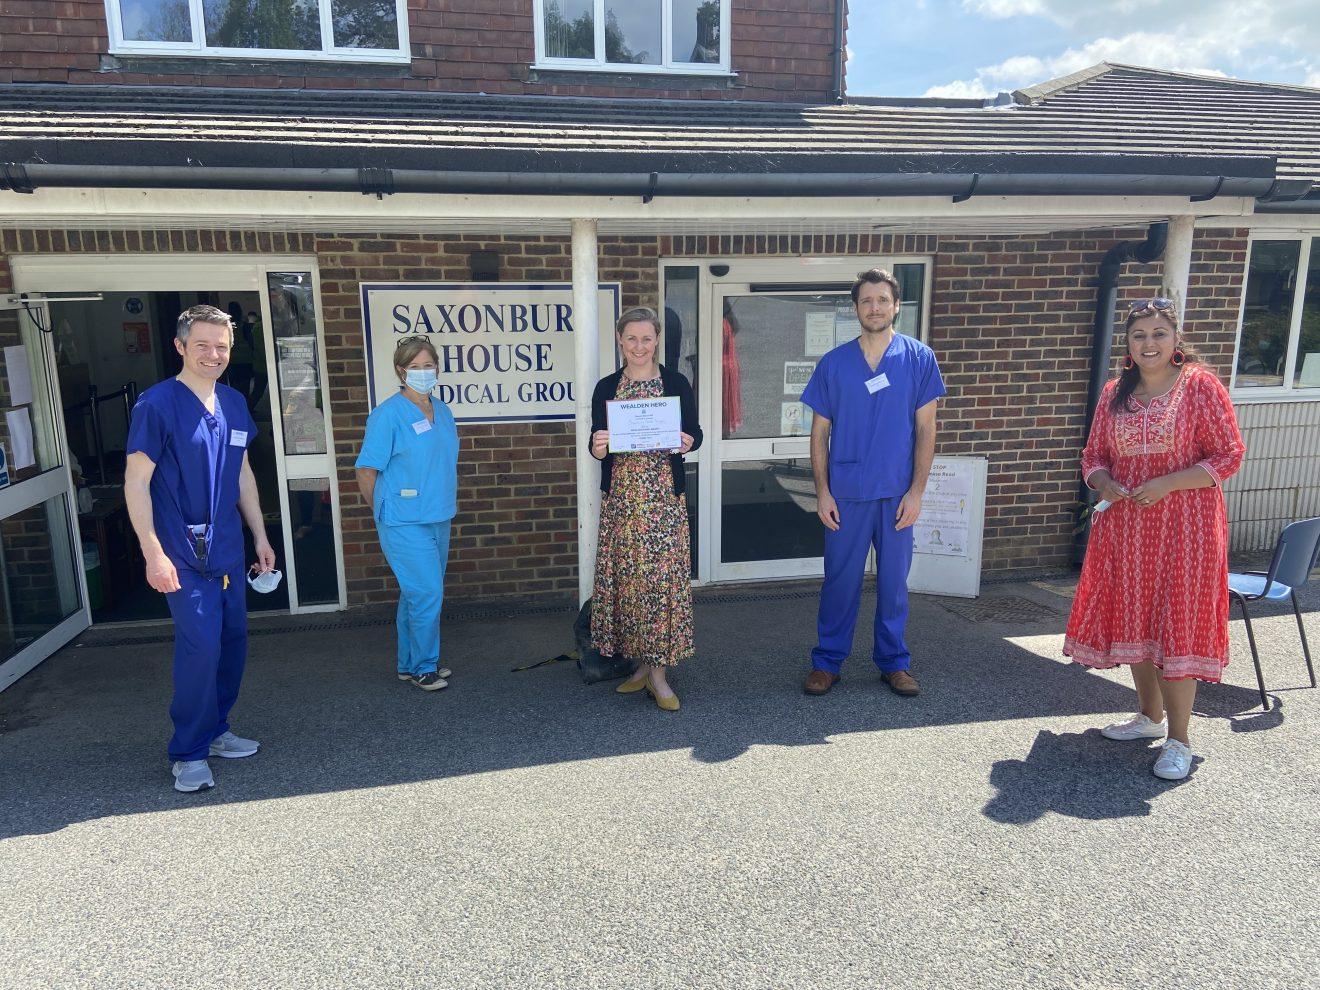 Weaden MP Saxonbury House Heroes Award